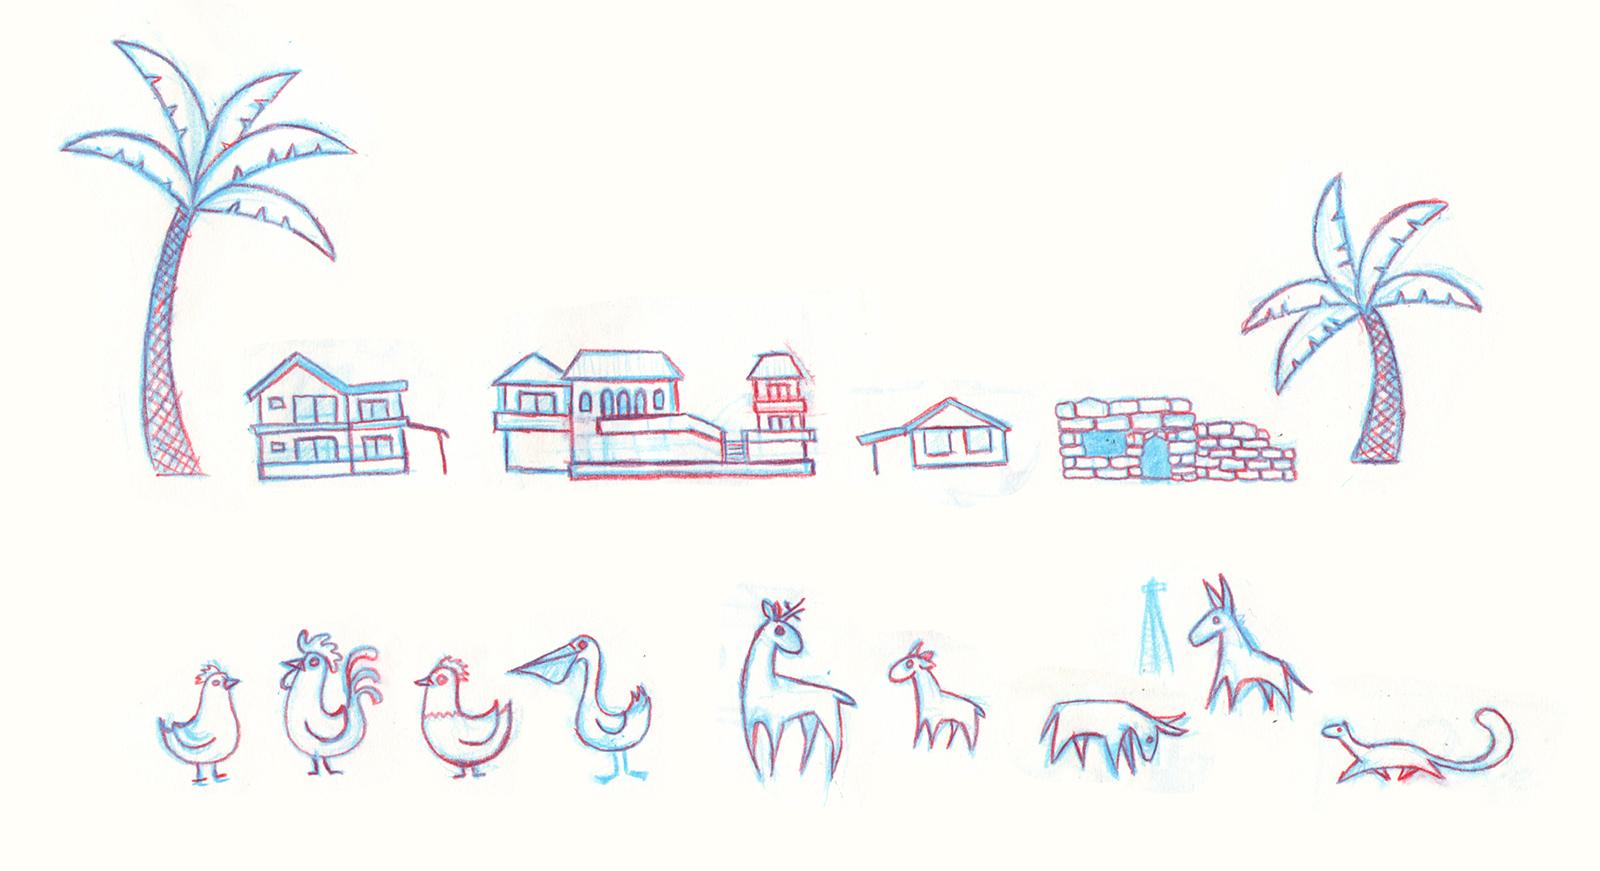 st-john-usvi-sketch-03 copy.jpg